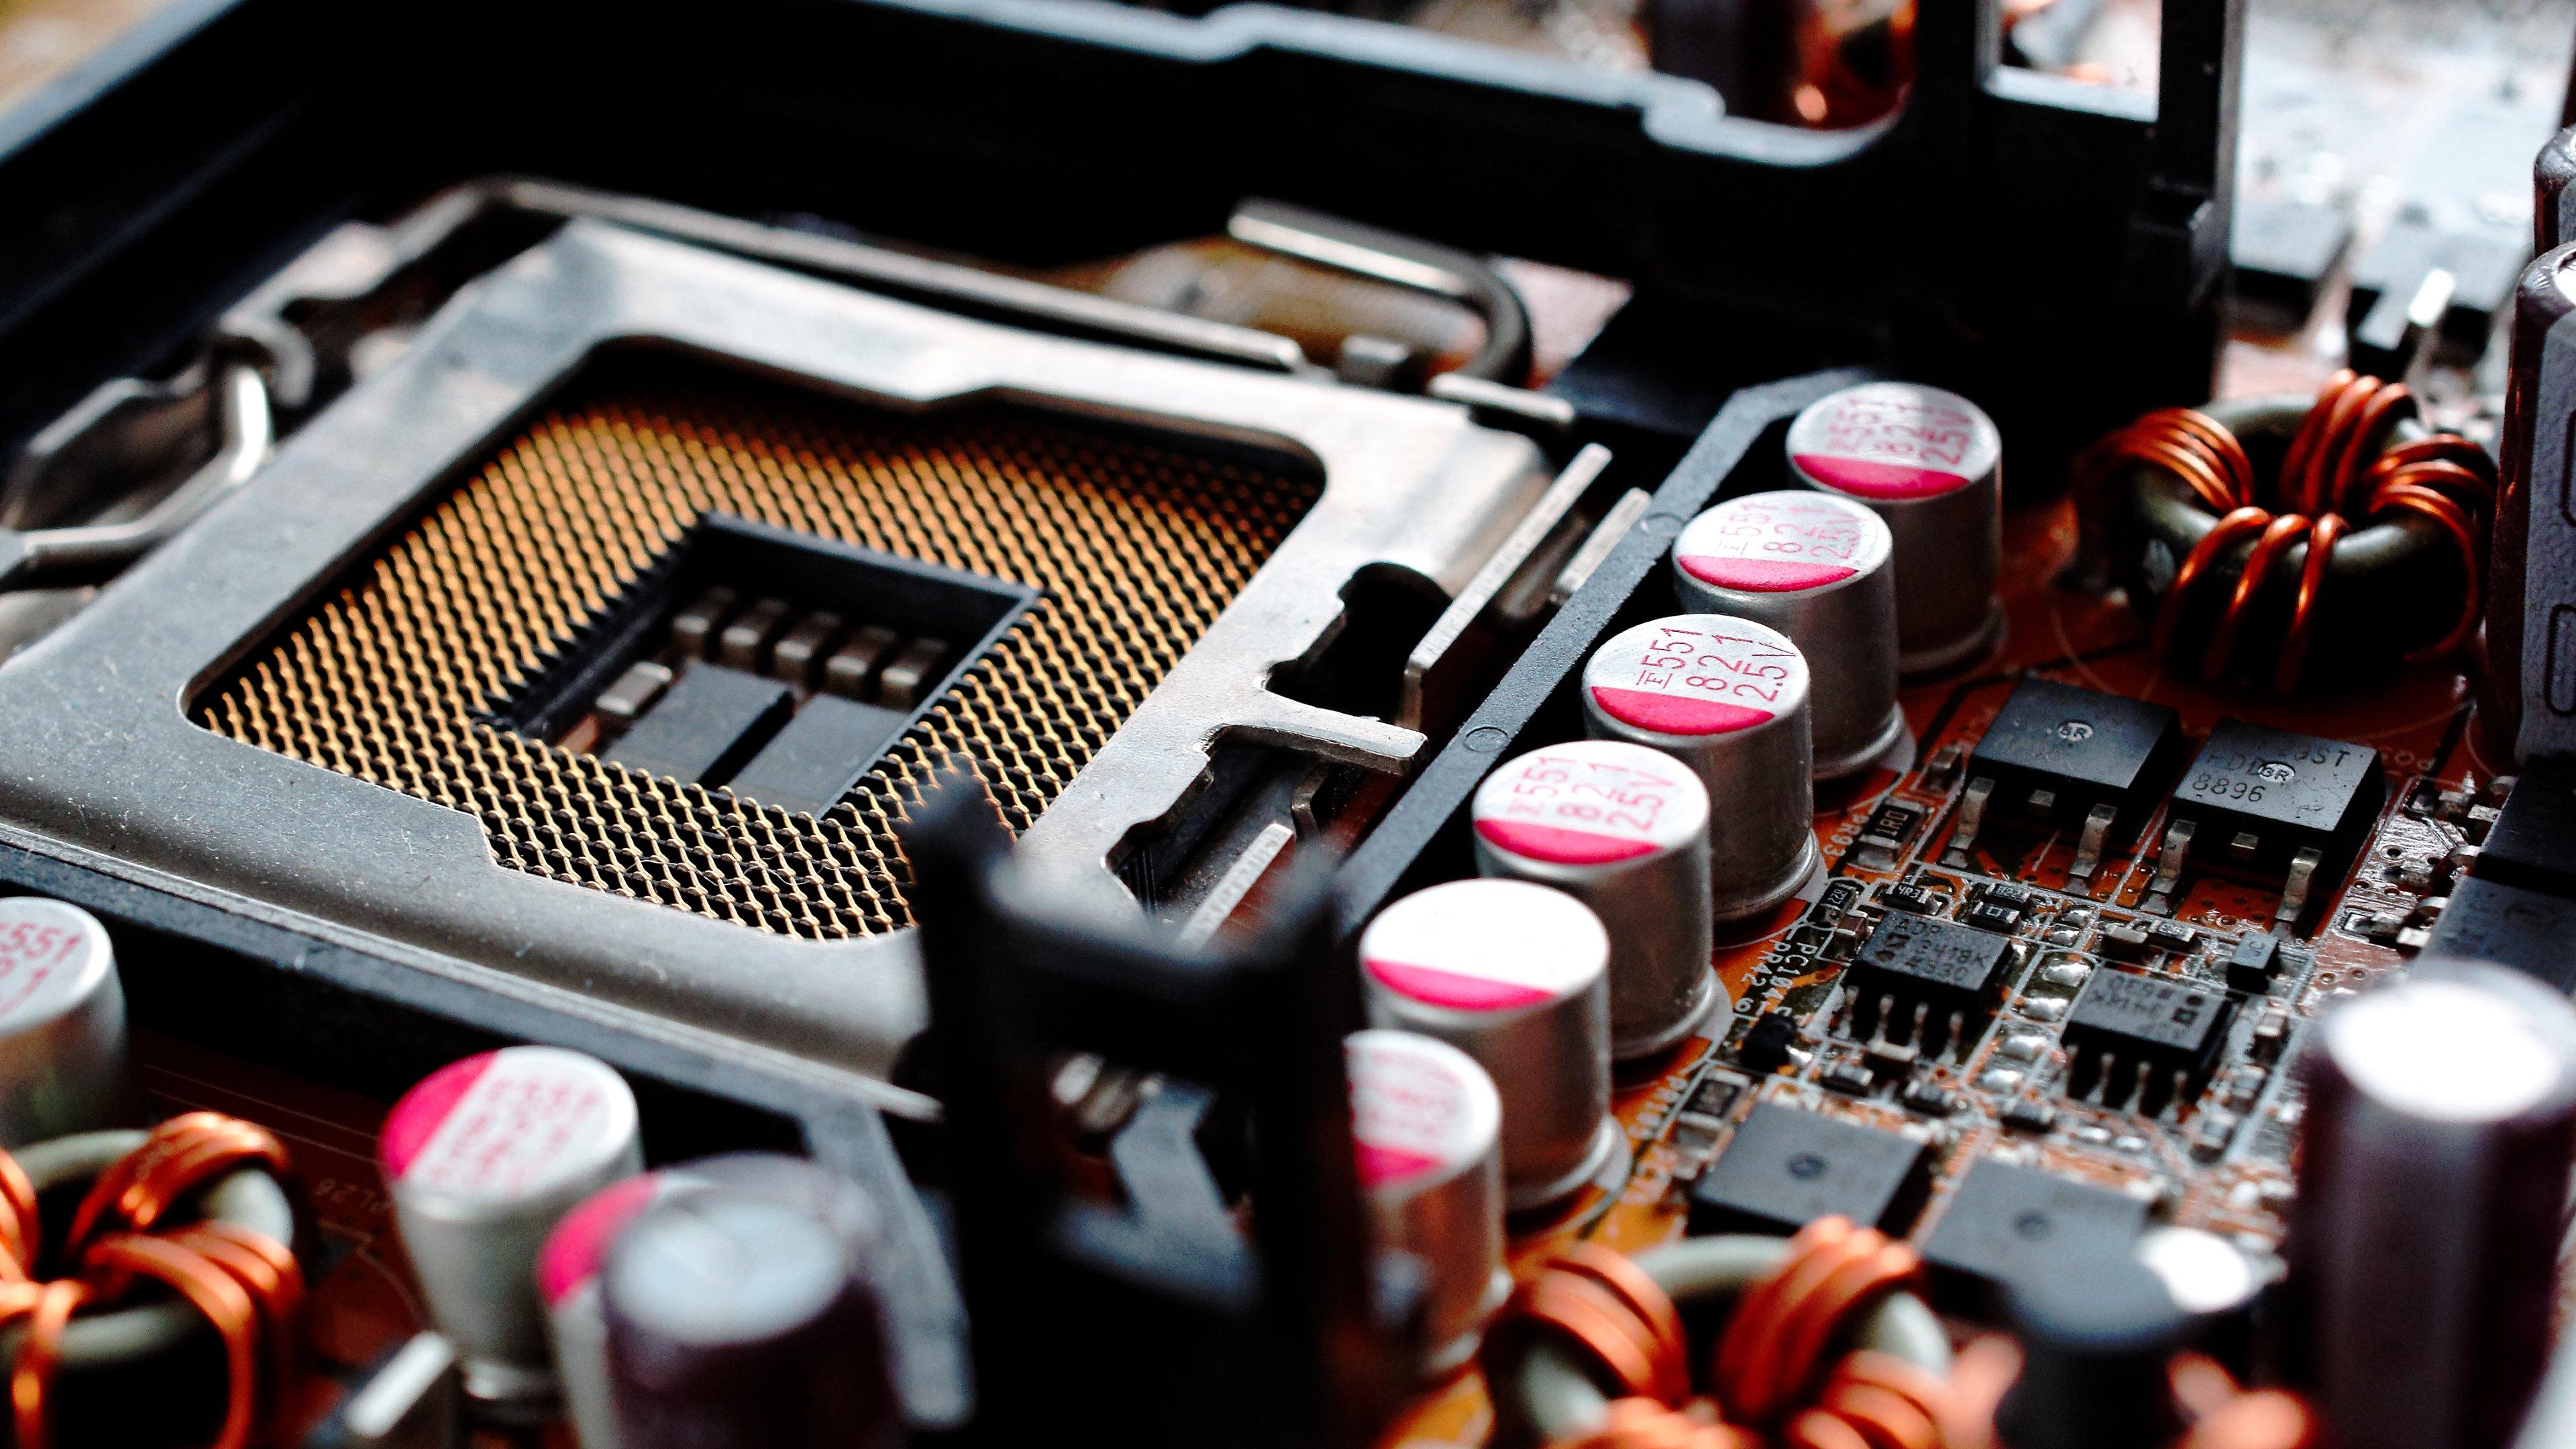 Motherboard CPU Socket Wallpaper 3840x2160